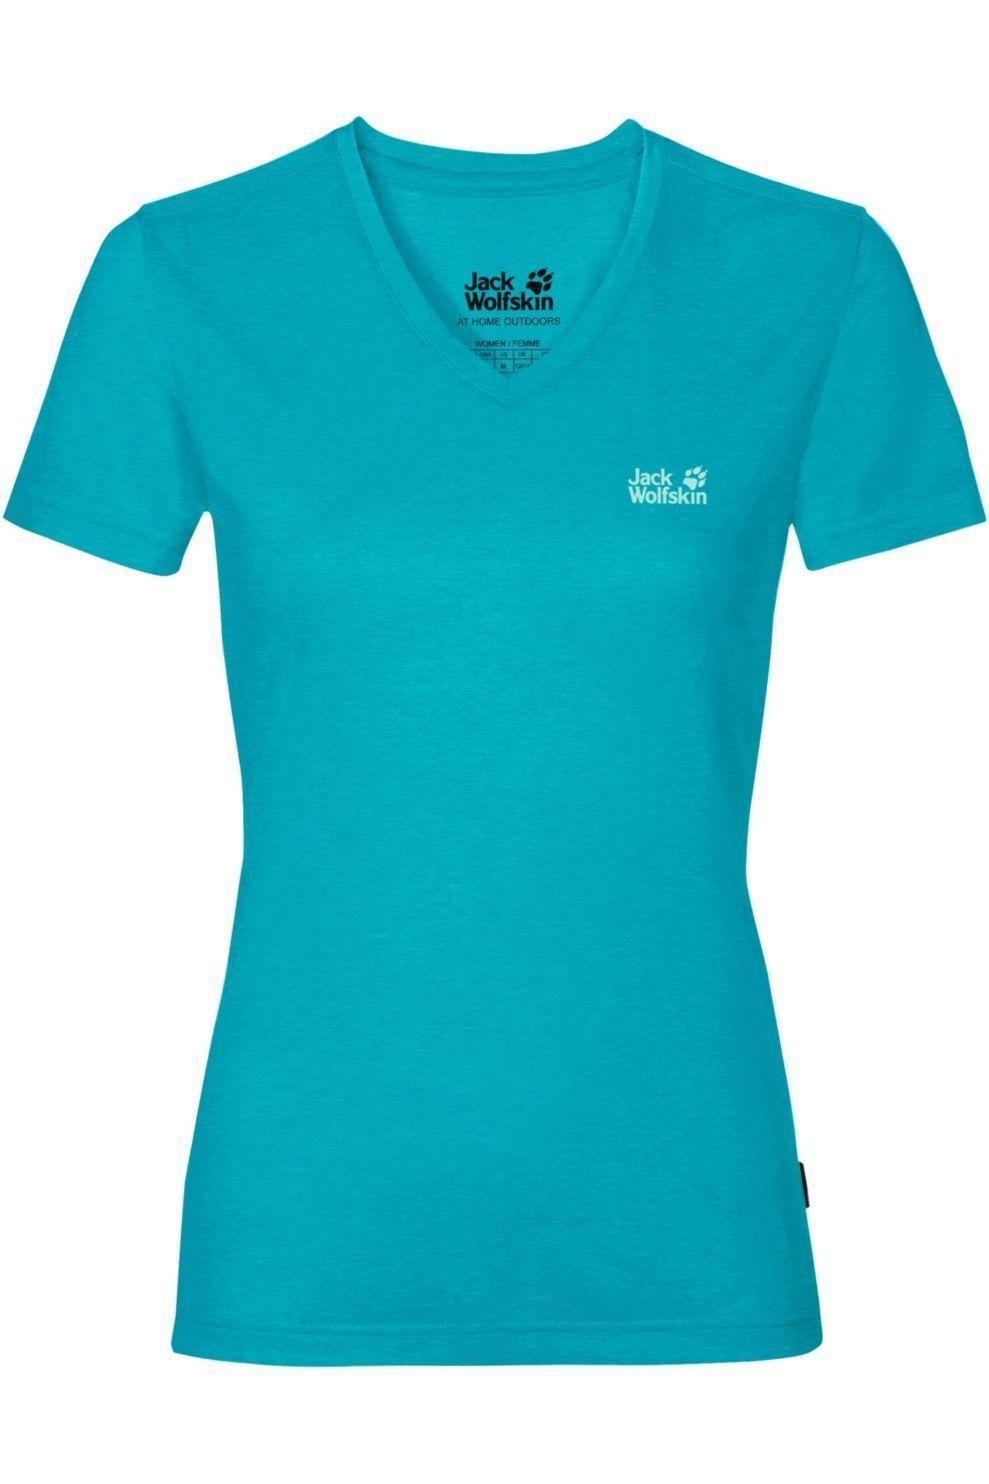 Jack Wolfskin T-Shirt Crosstrail voor dames Blauw Maten: S, M, L, XL